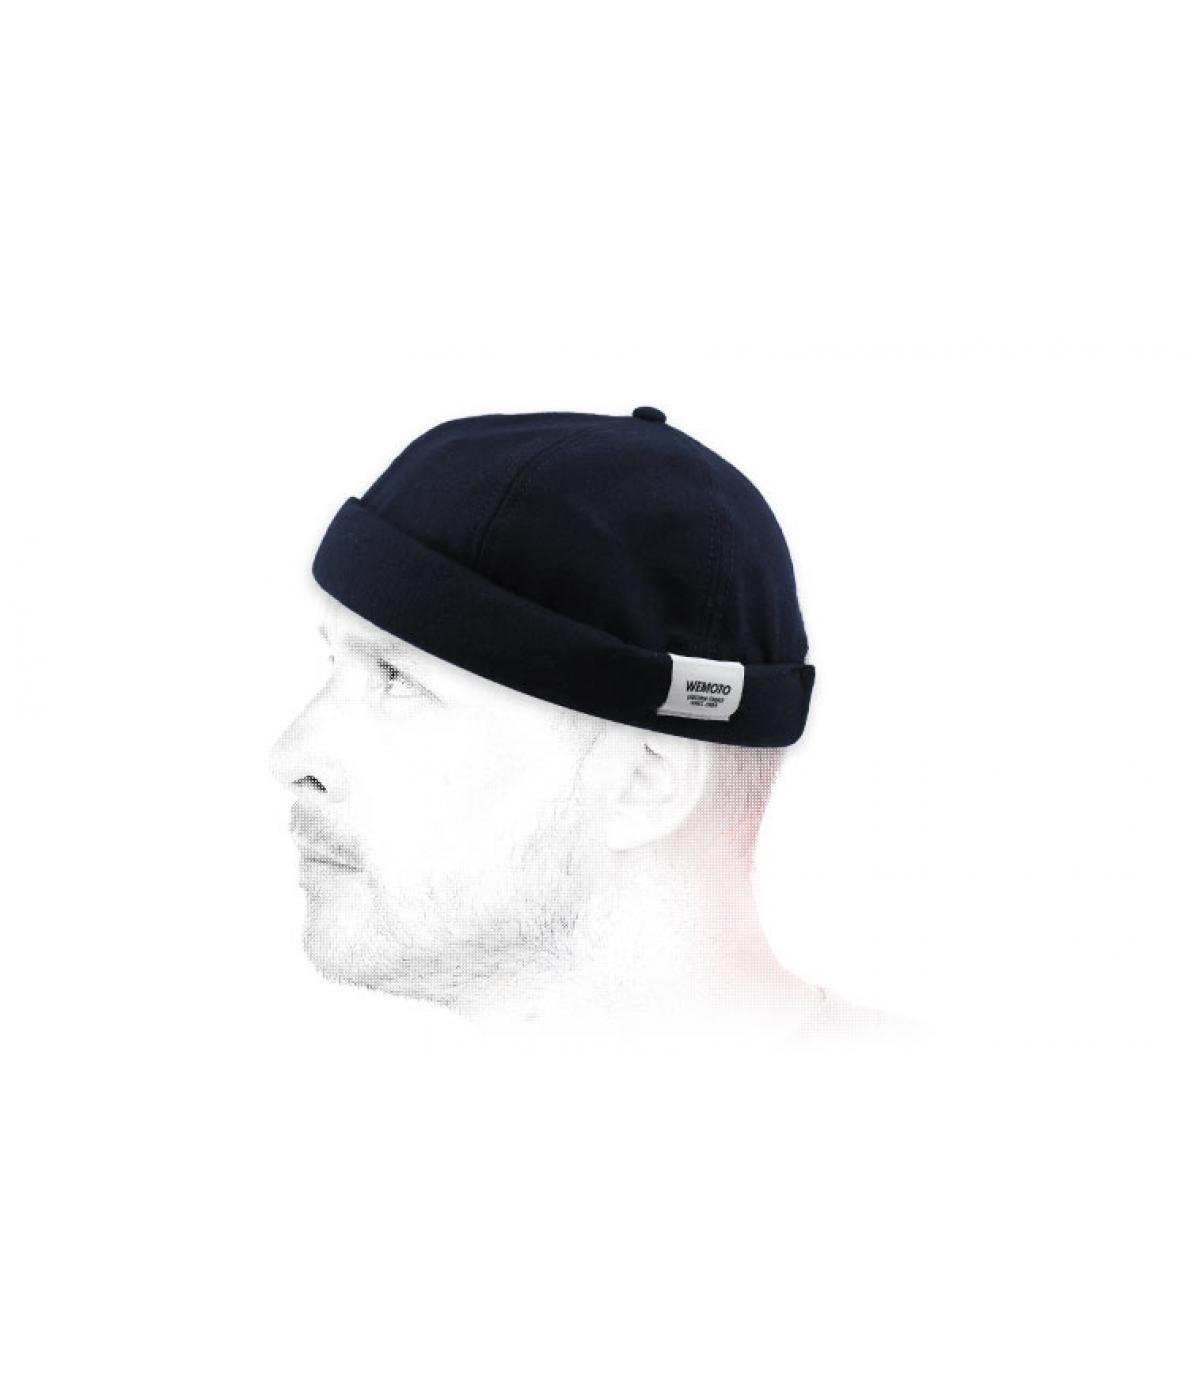 bonnet docker marine Wemoto